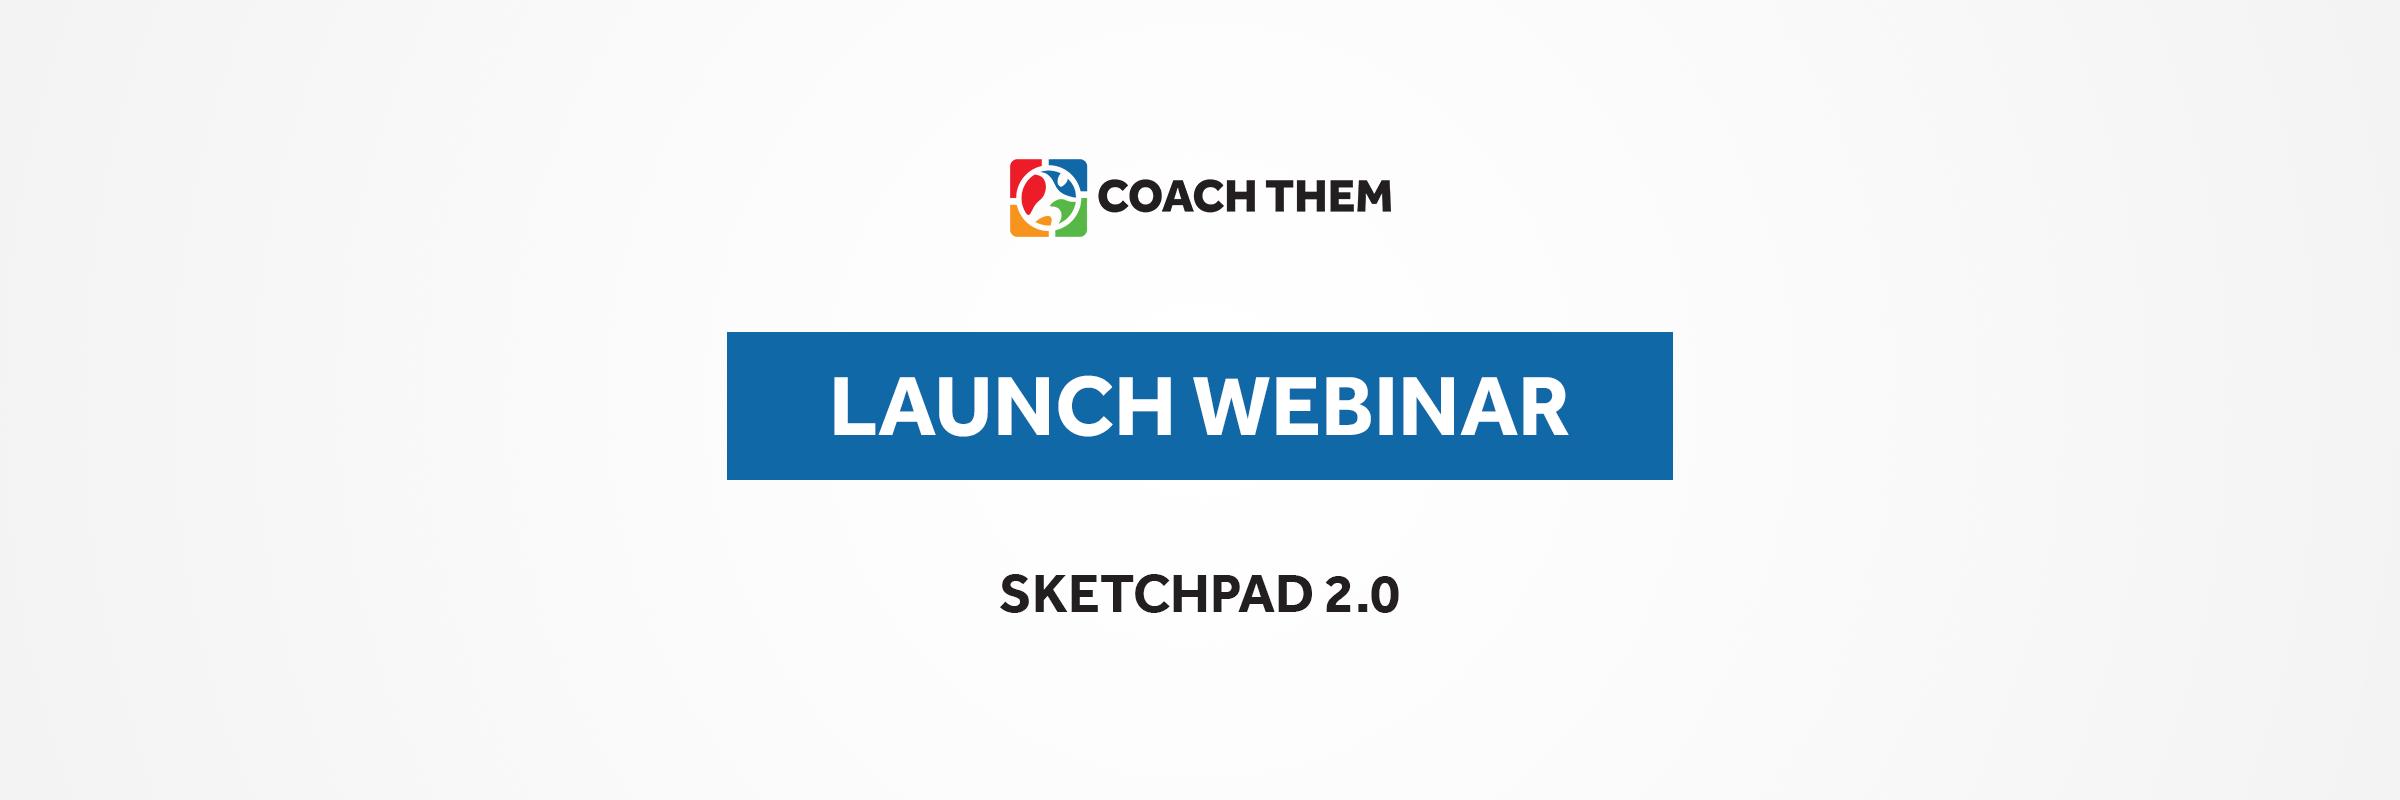 Sketchpad 2.0   Live Launch Webinar